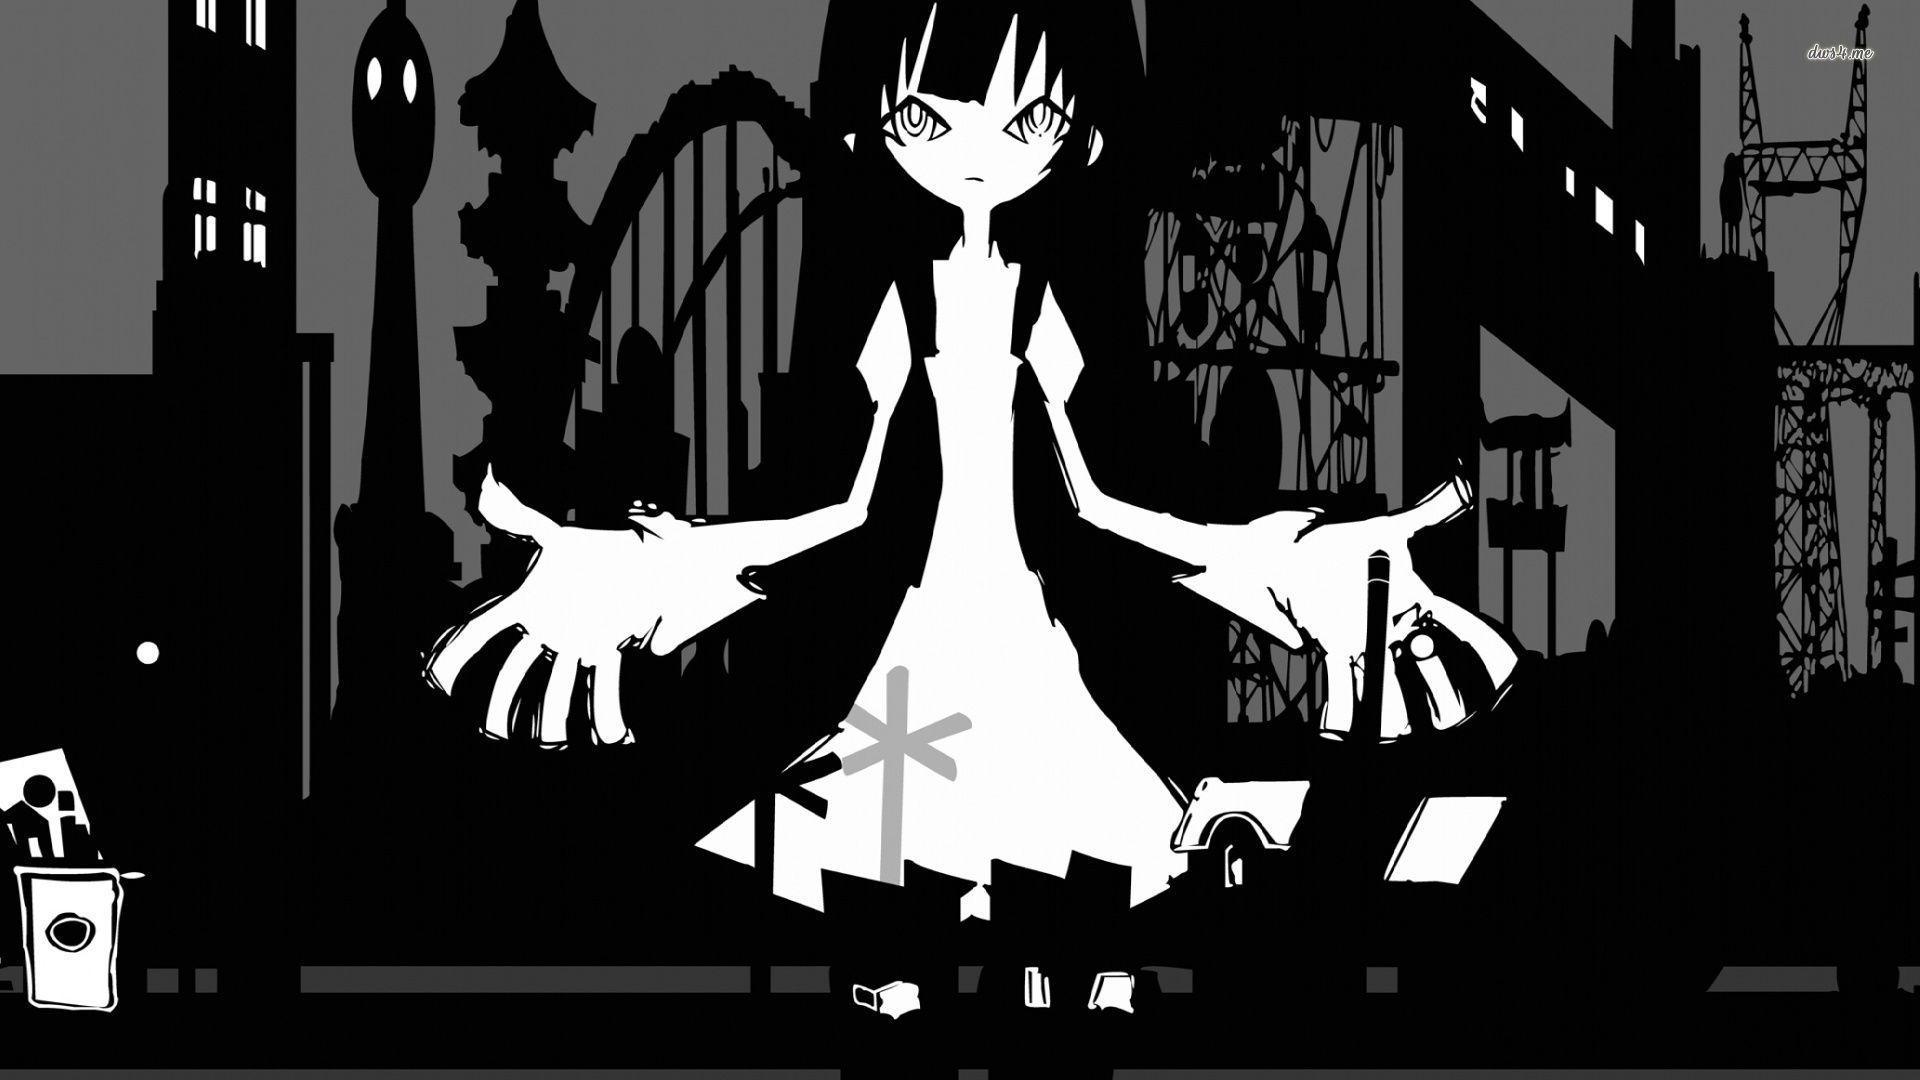 Dark Hitagi Senjougahara Bakemonogatari Hd Wallpaper Cool Anime Wallpapers Anime Wallpaper Wallpaper